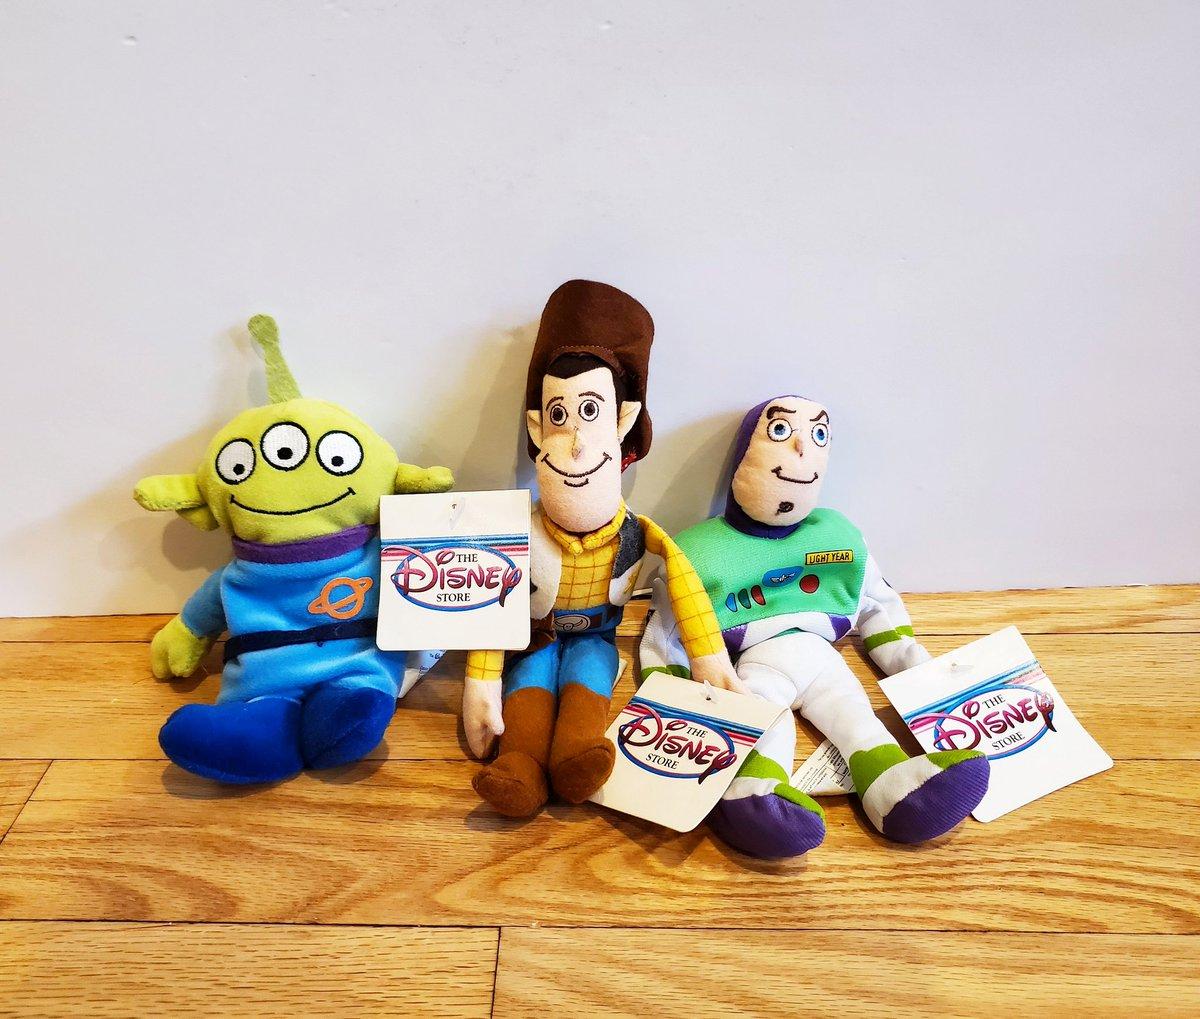 Vintage Disney Toy Story Beanies  https://t.co/VqKhwY08DF  #vintagetoystory #toystorytoys #toystorytoy #toystory #toystoryplush #toystorybeanie  #buzzlightyear #woody #toystoryalien #90sdisney #disney90s #disneybeanie #disneybeanies #vintagedisneytoys  #disneyplushies https://t.co/a3XVcOf6XU